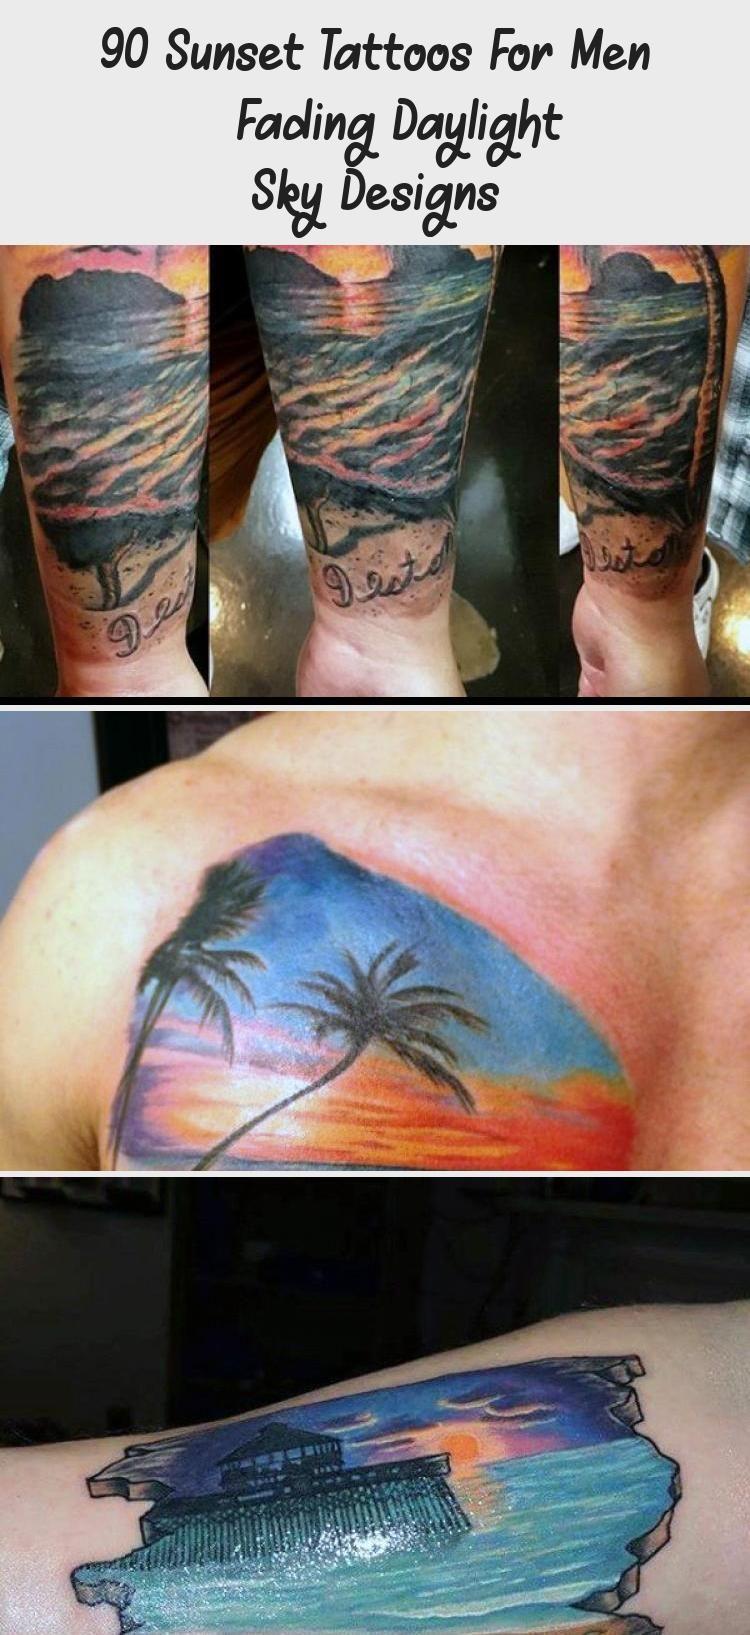 90 Sunset Tattoos For Men Fading Daylight Sky Designs